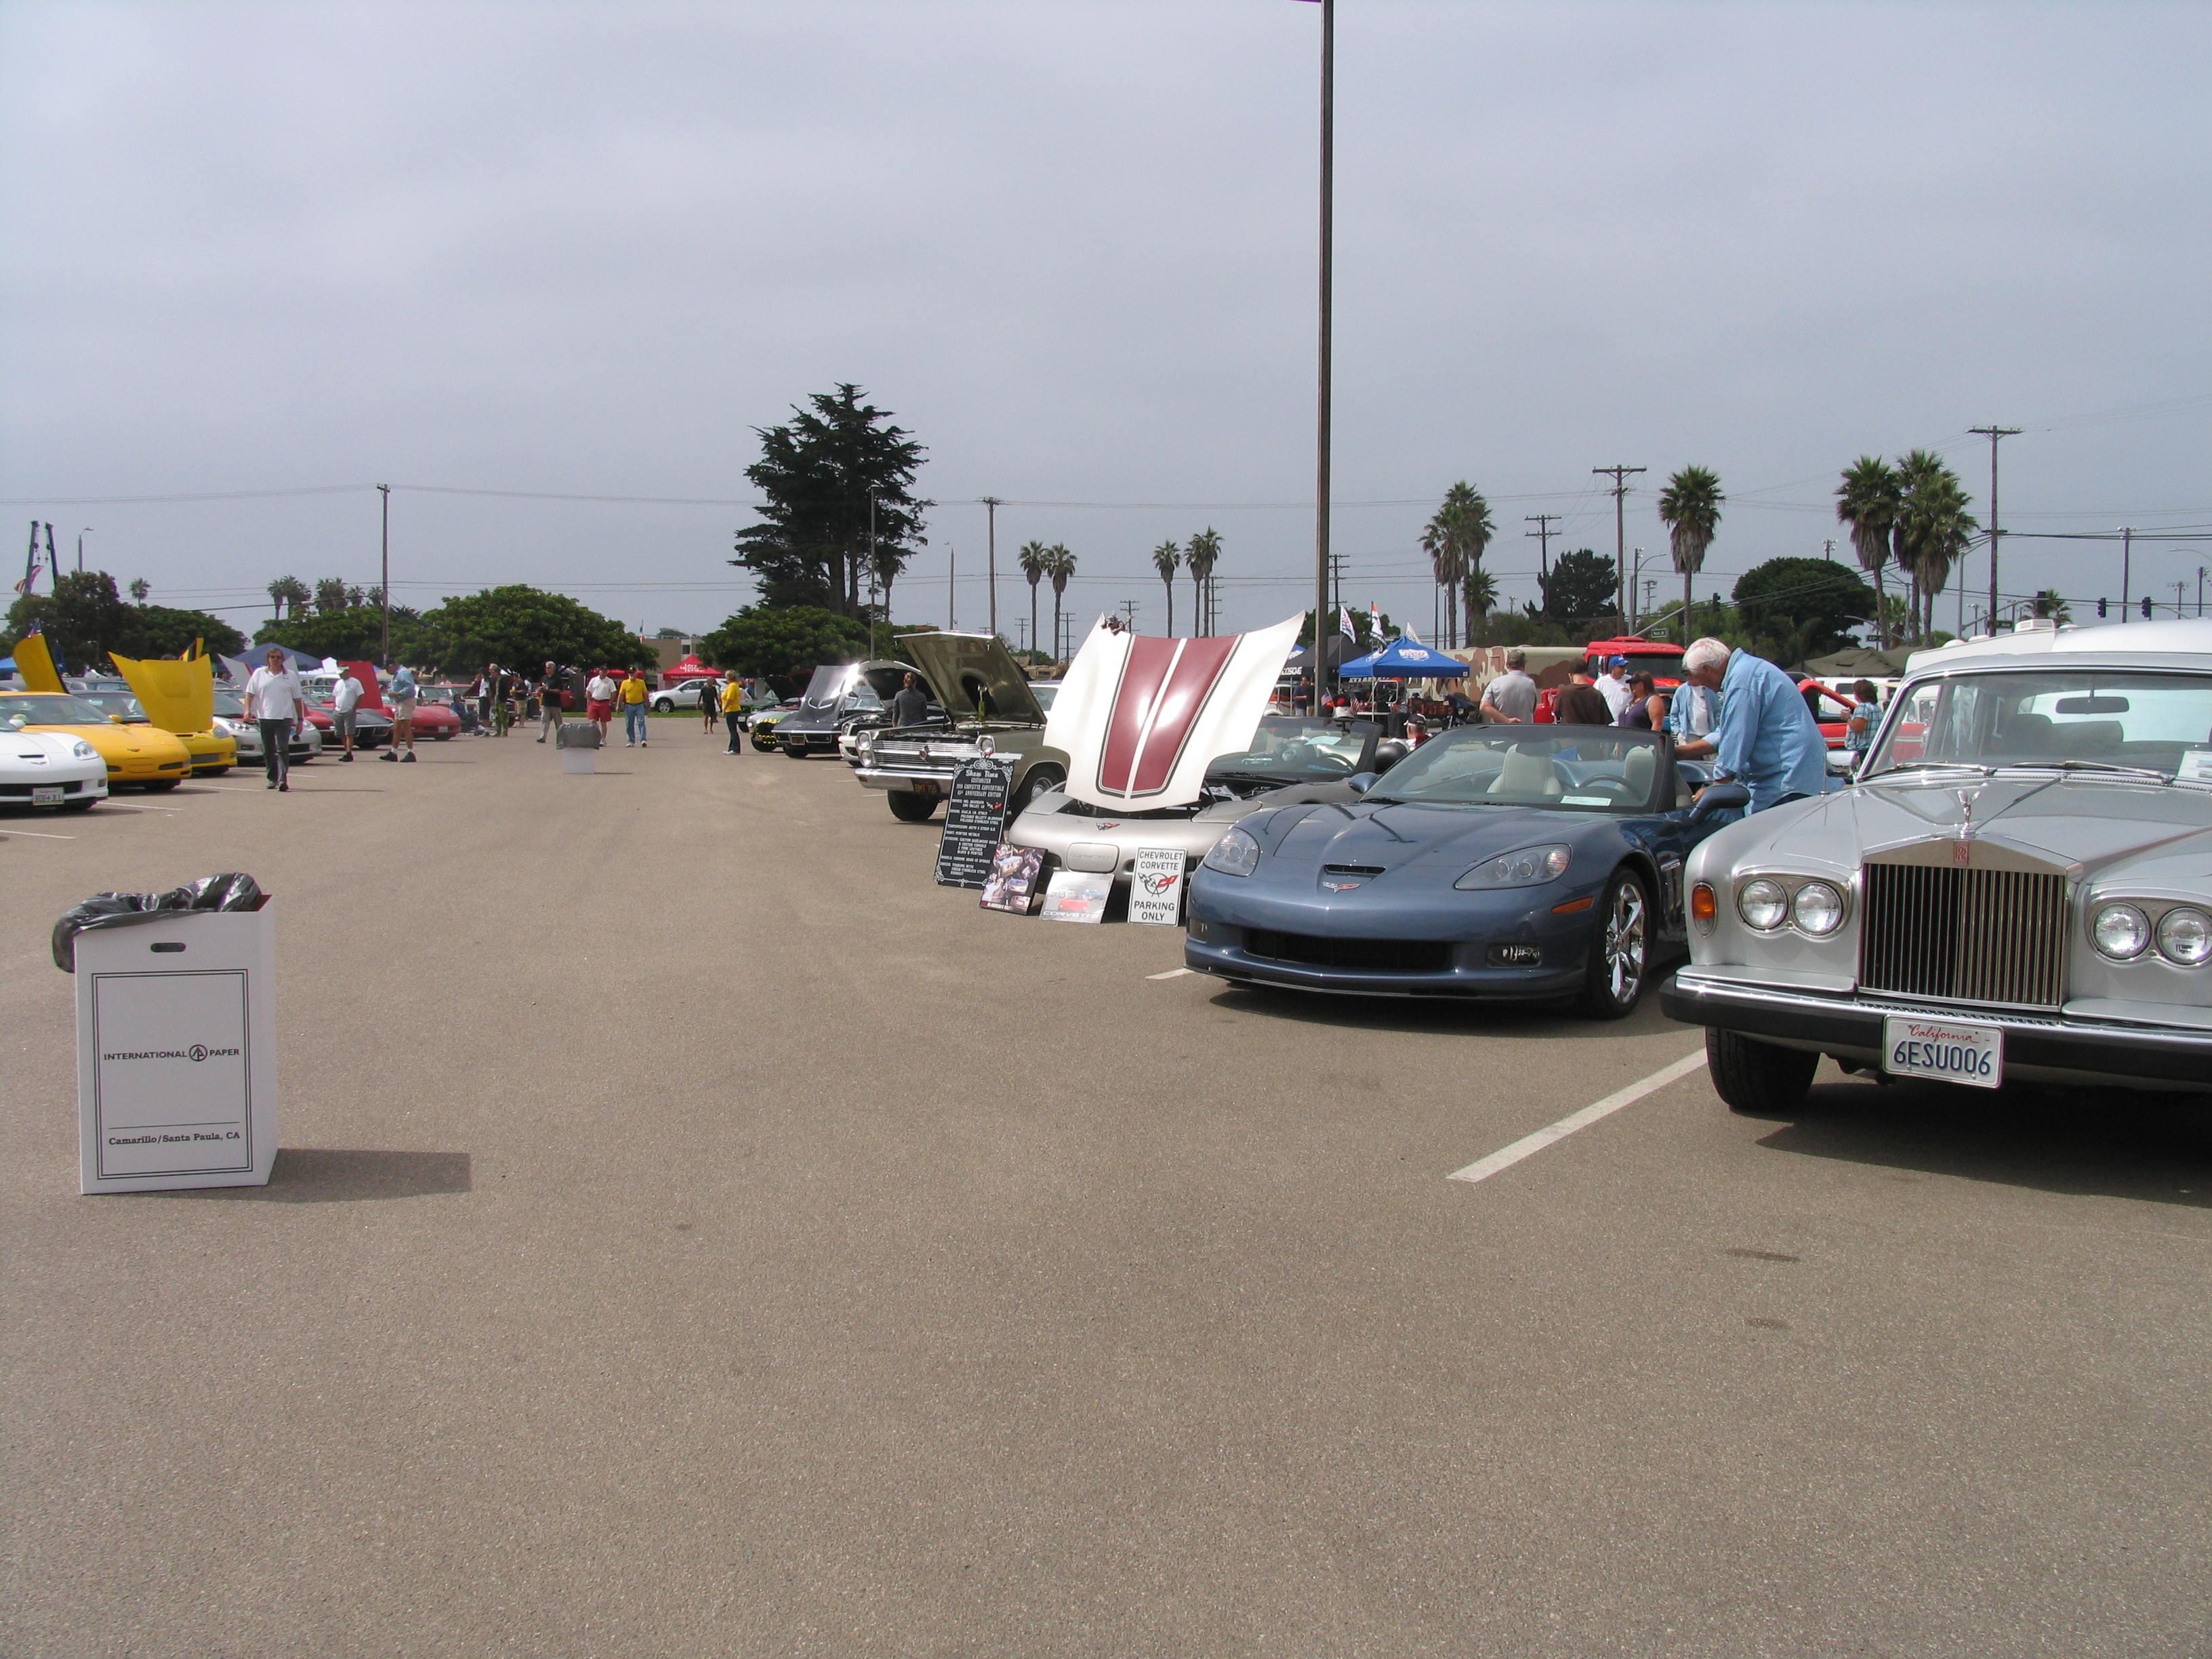 Seabee Days Car Show, Port Hueneme – July 23, 2011